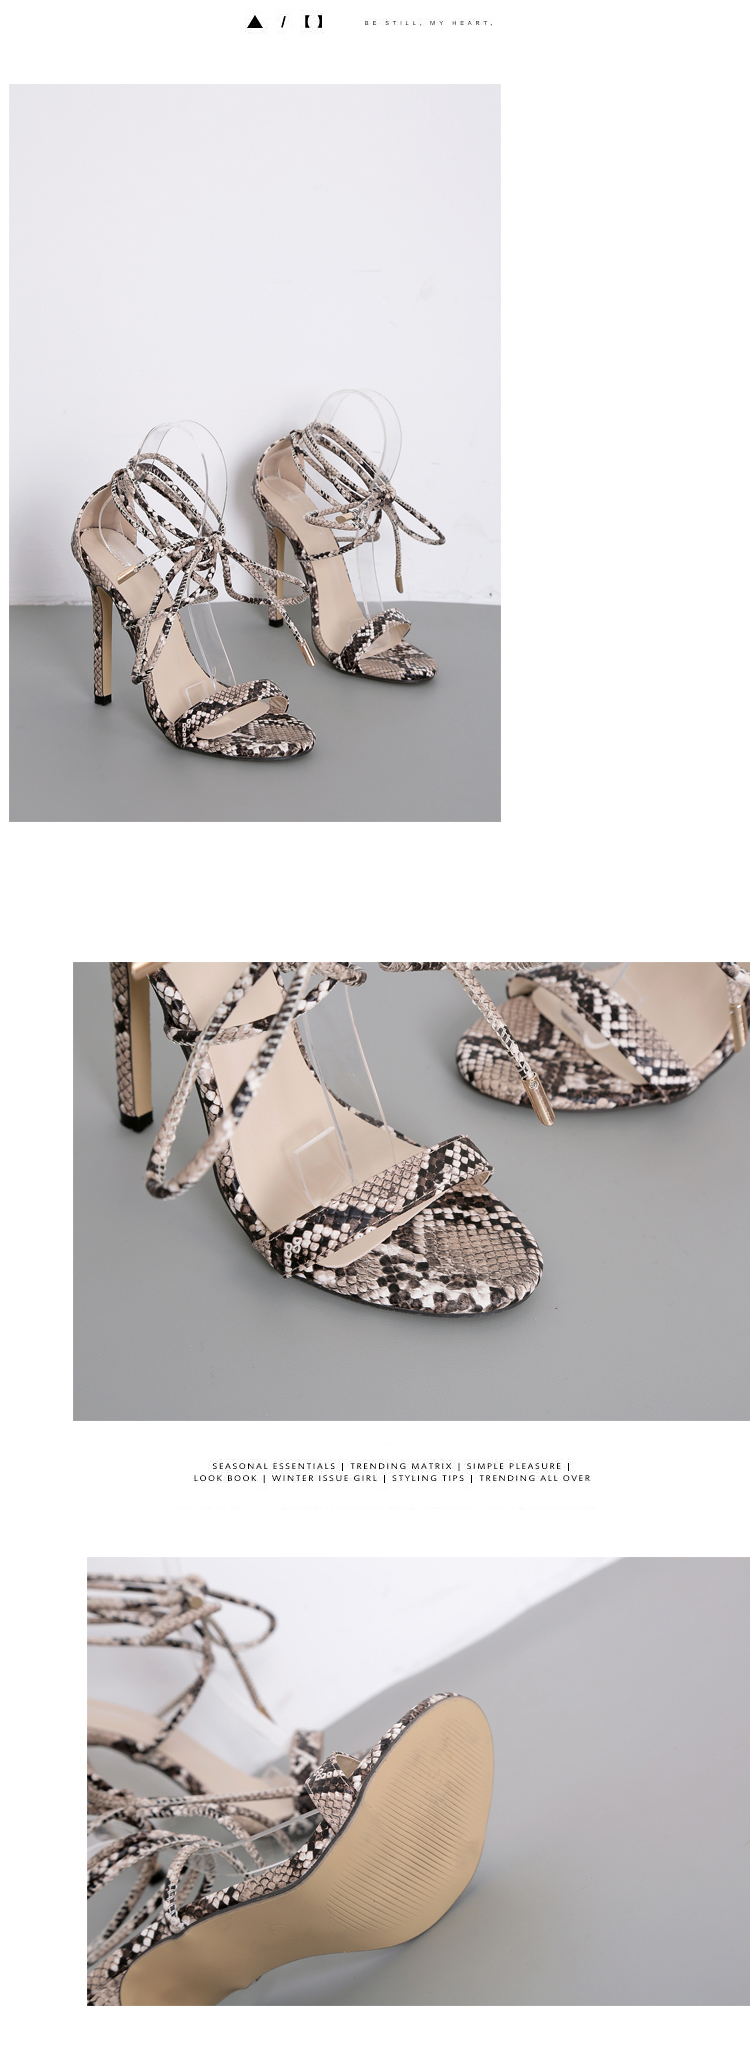 HTB1TtERX5LrK1Rjy1zdq6ynnpXao Aneikeh Fashion 2019 Summer Women's Sandals PU Lace-Up Thin High Heels Cover Heel Shallow Mature Serpentine Dance Solid 35-40